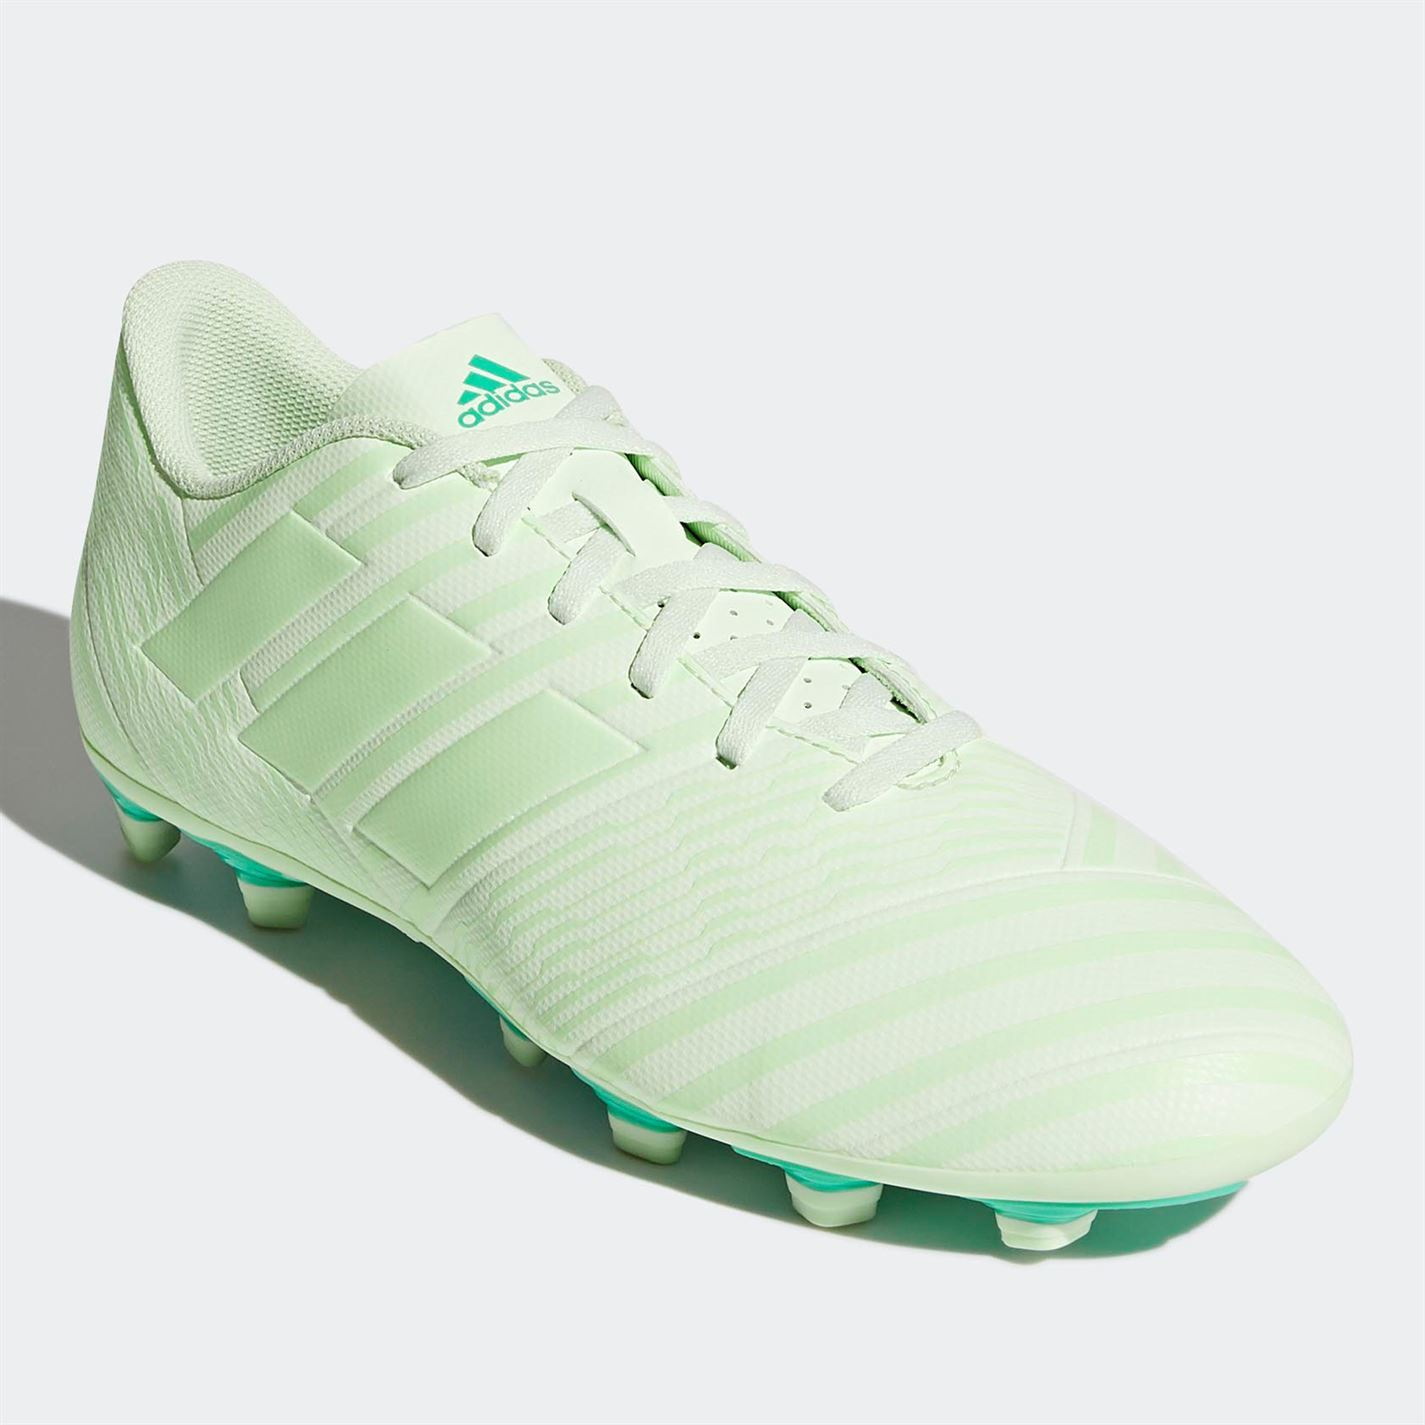 adidas nemeziz 17.4 fg uomo football boots